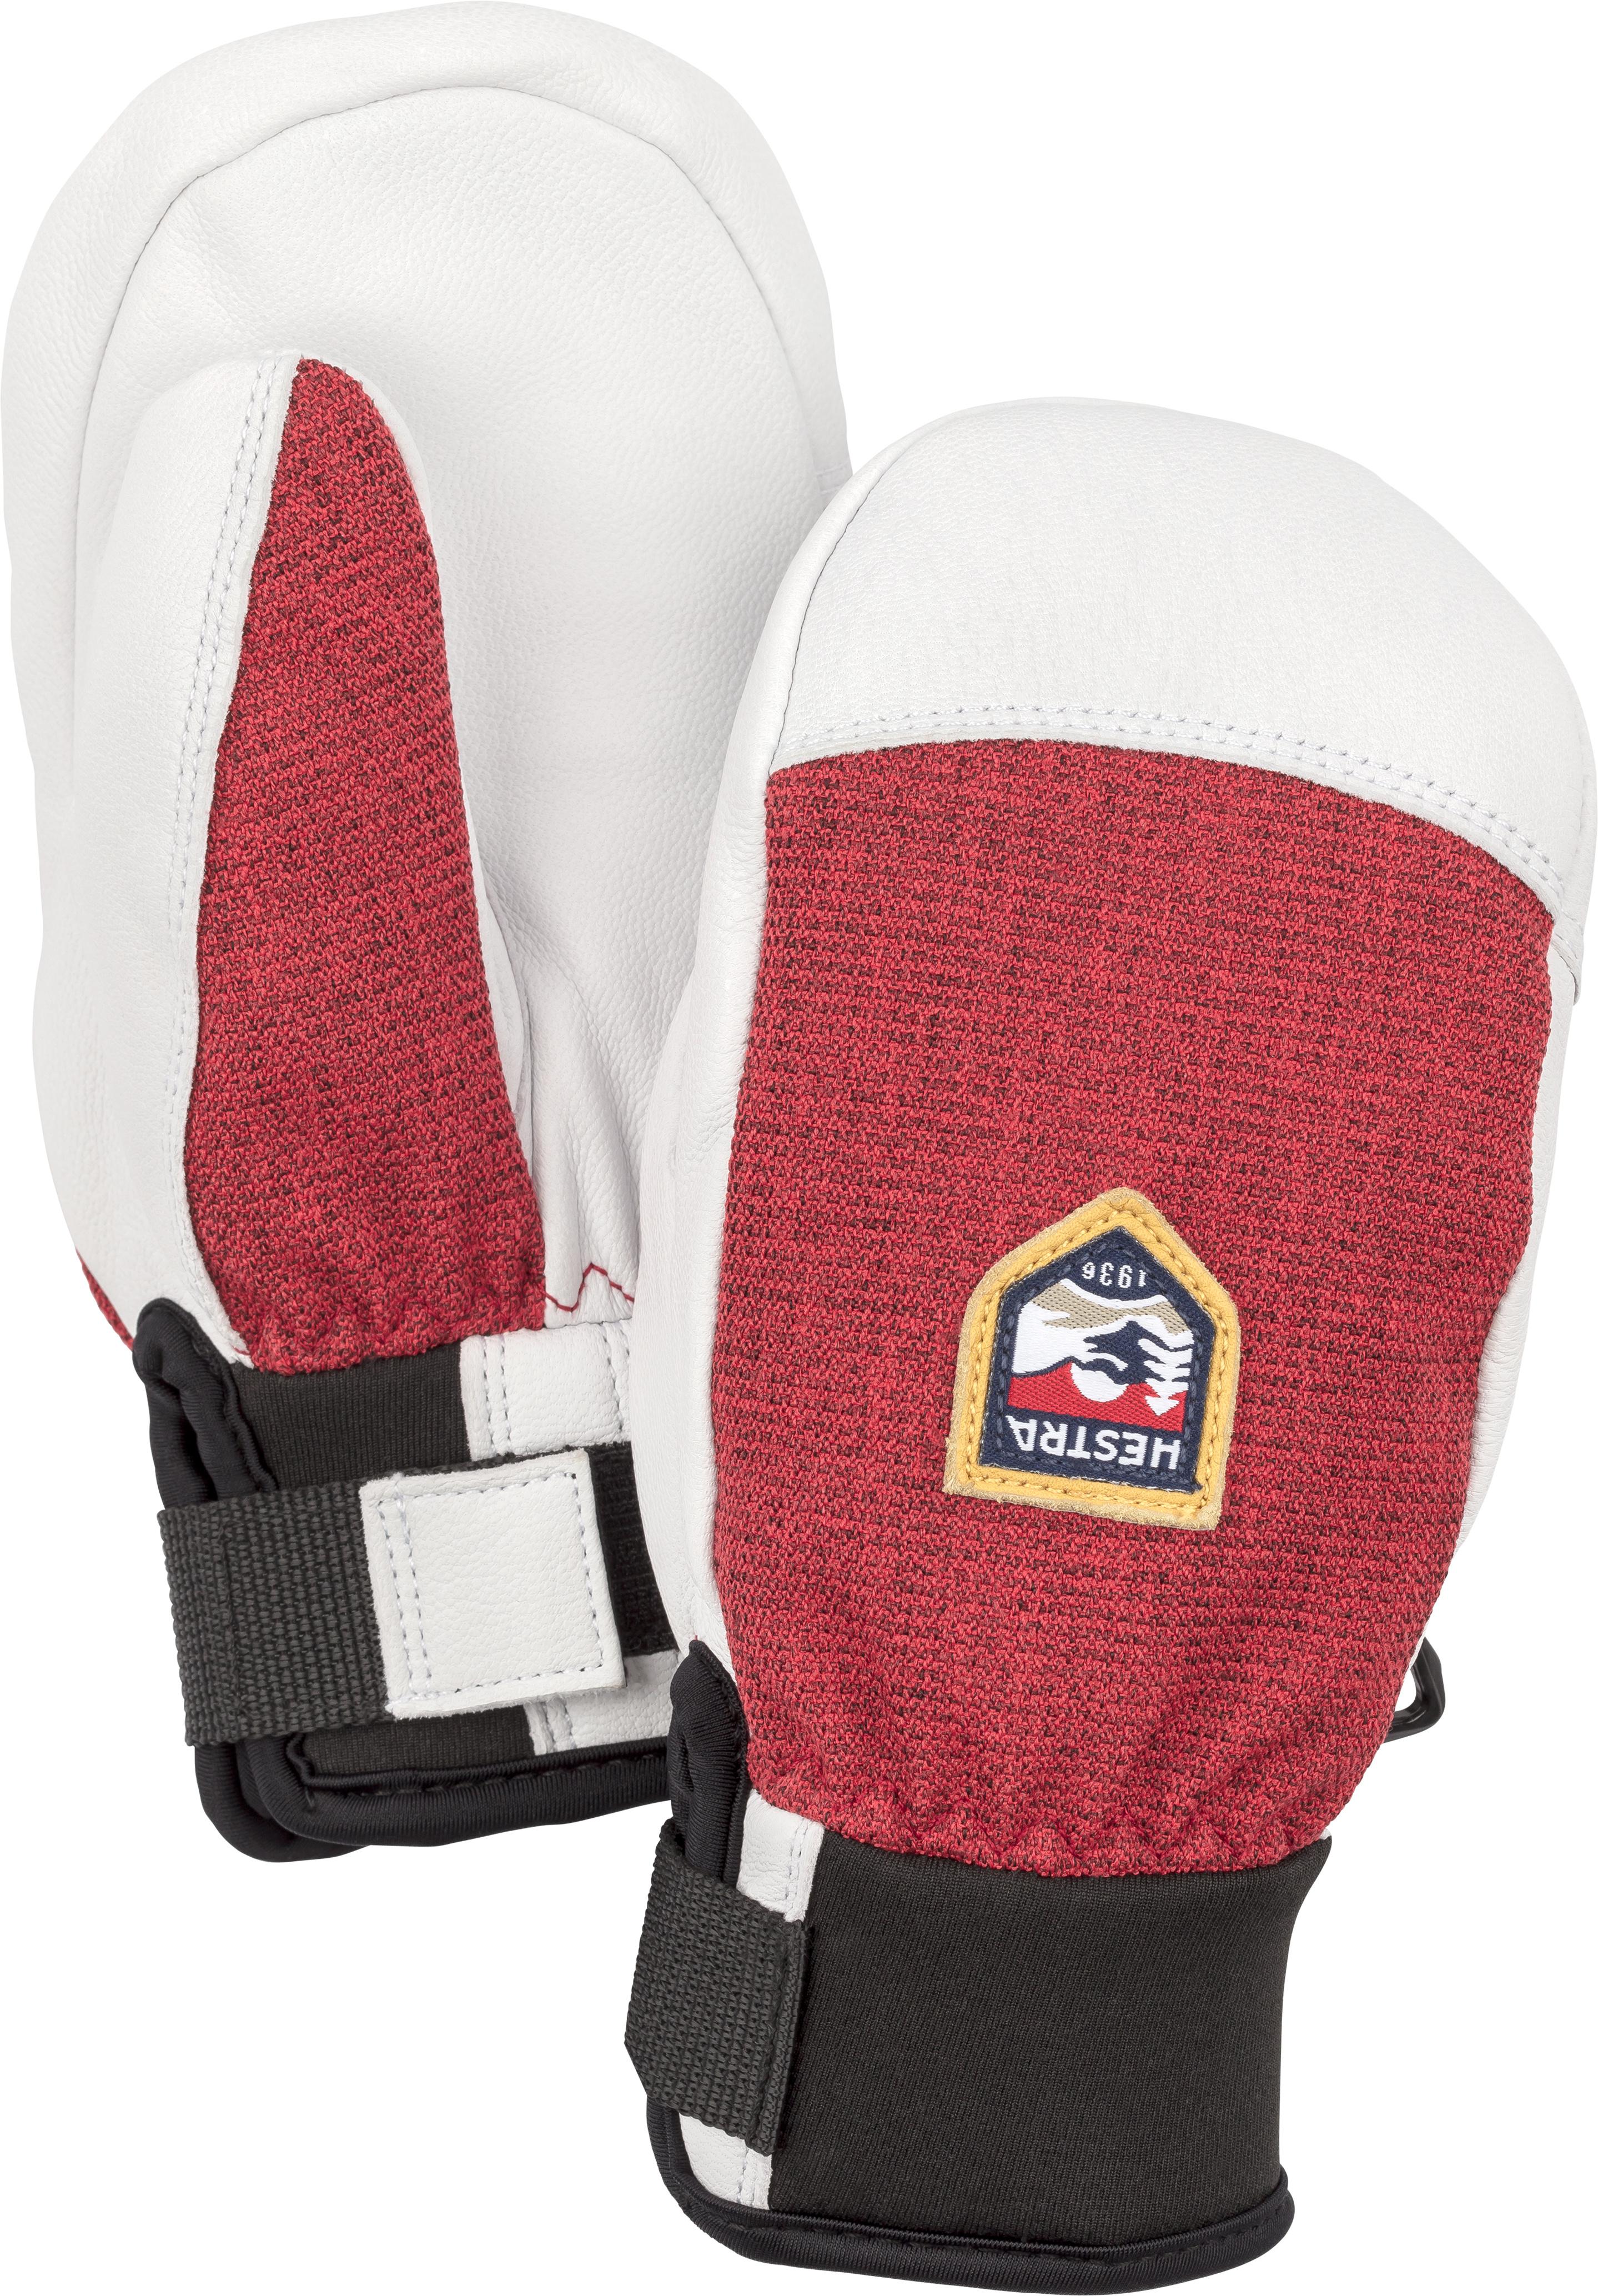 Hestra Army Leather Patrol Junior Mitt - Kid s 06458090231b